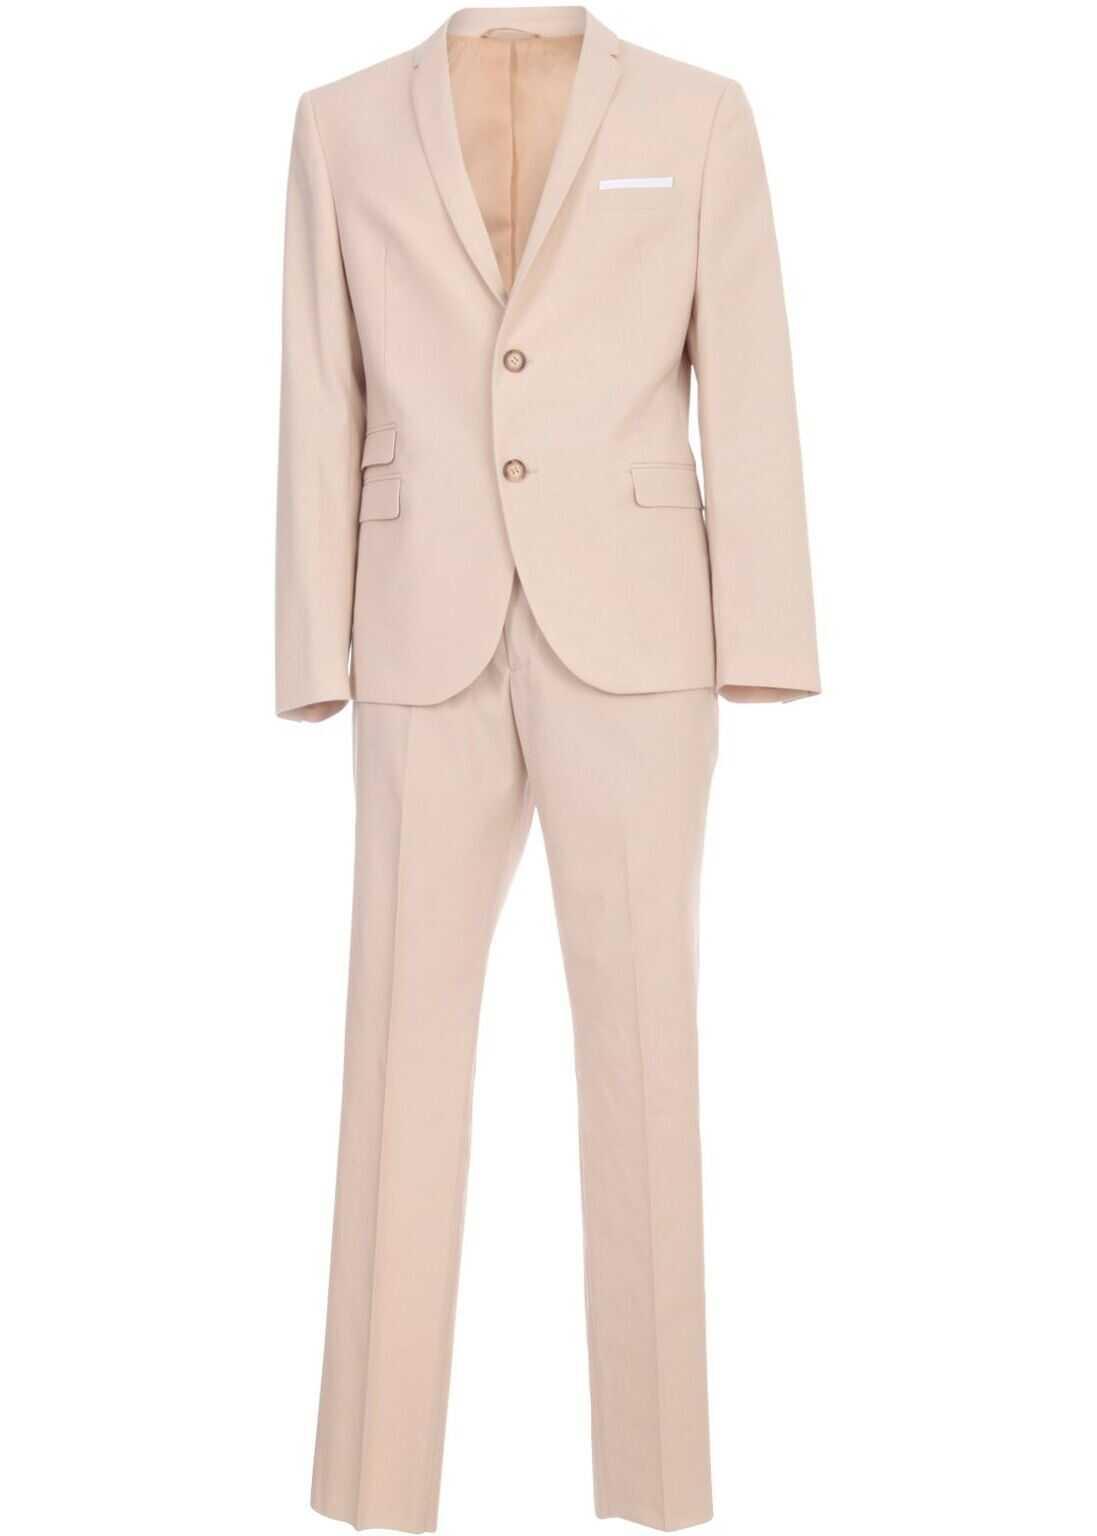 Neil Barrett Polyester Suit PINK